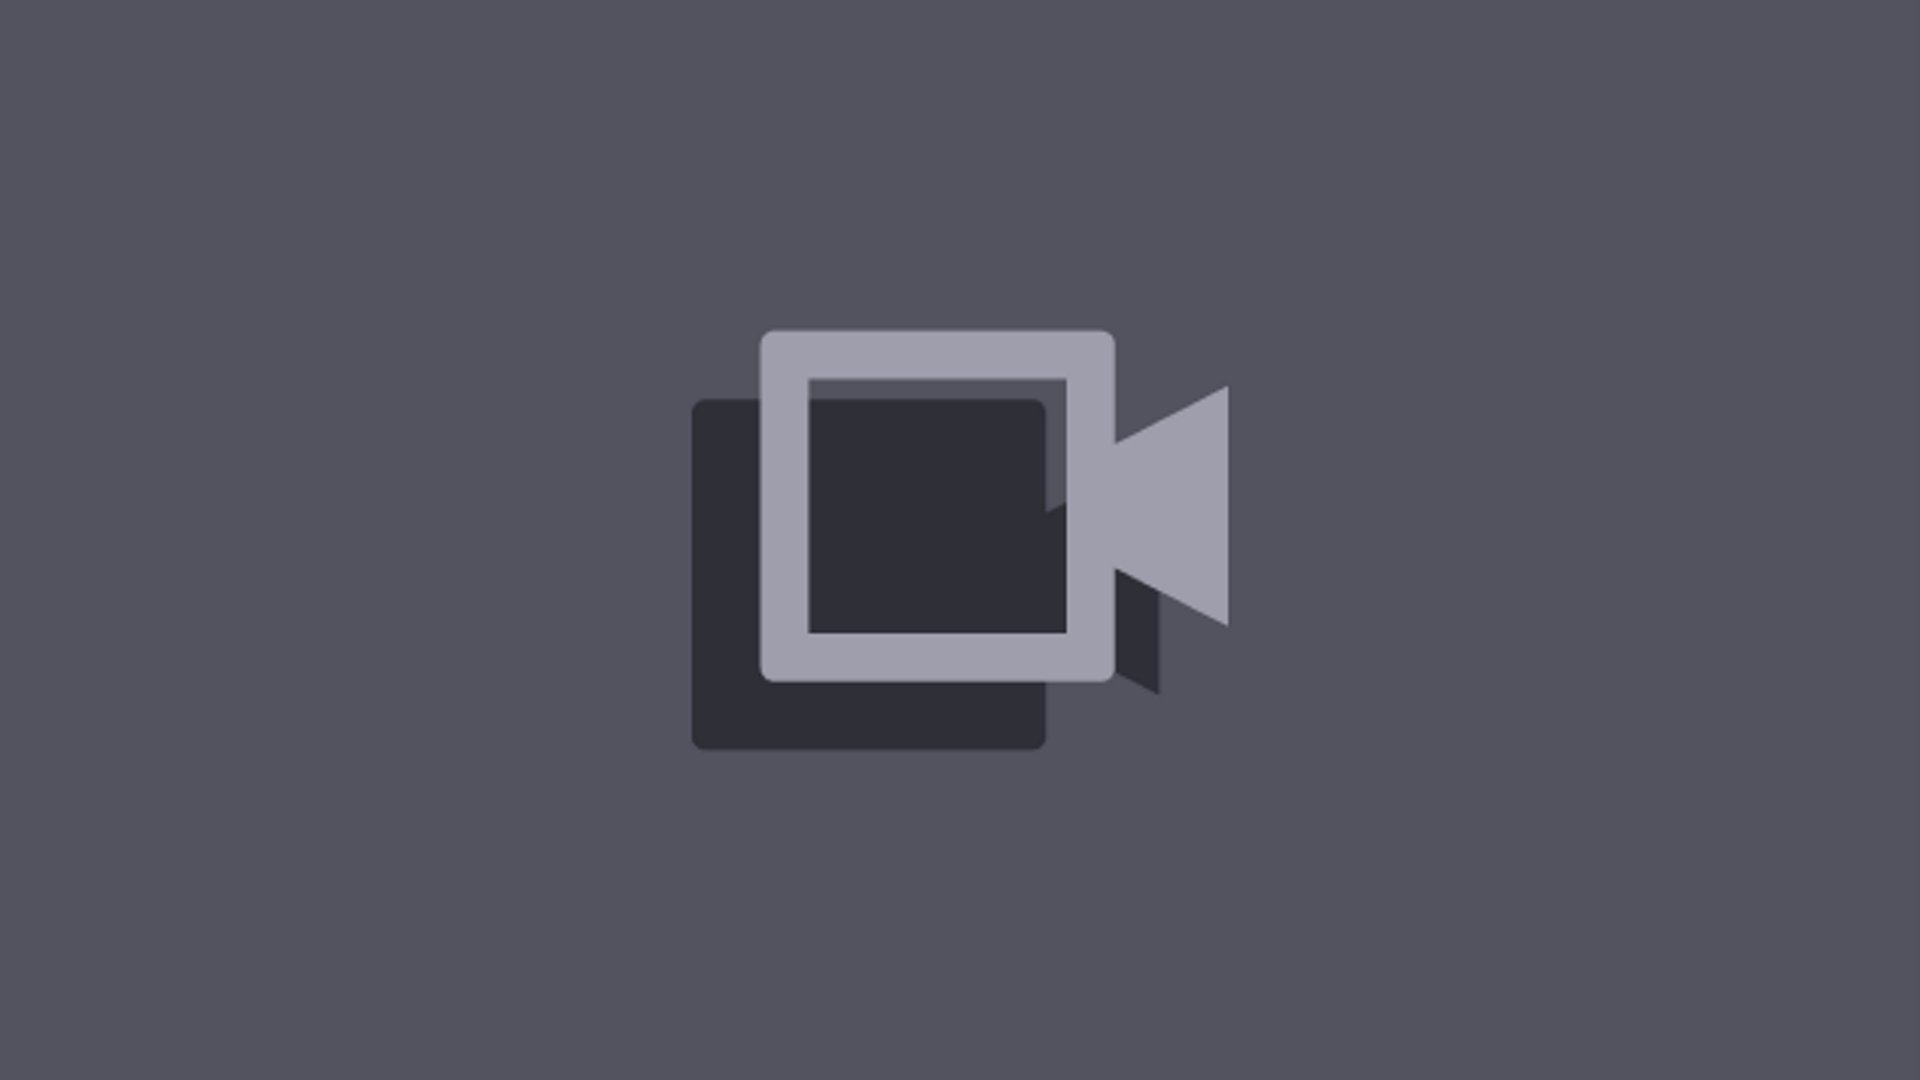 Twitch stream of Deeter1910